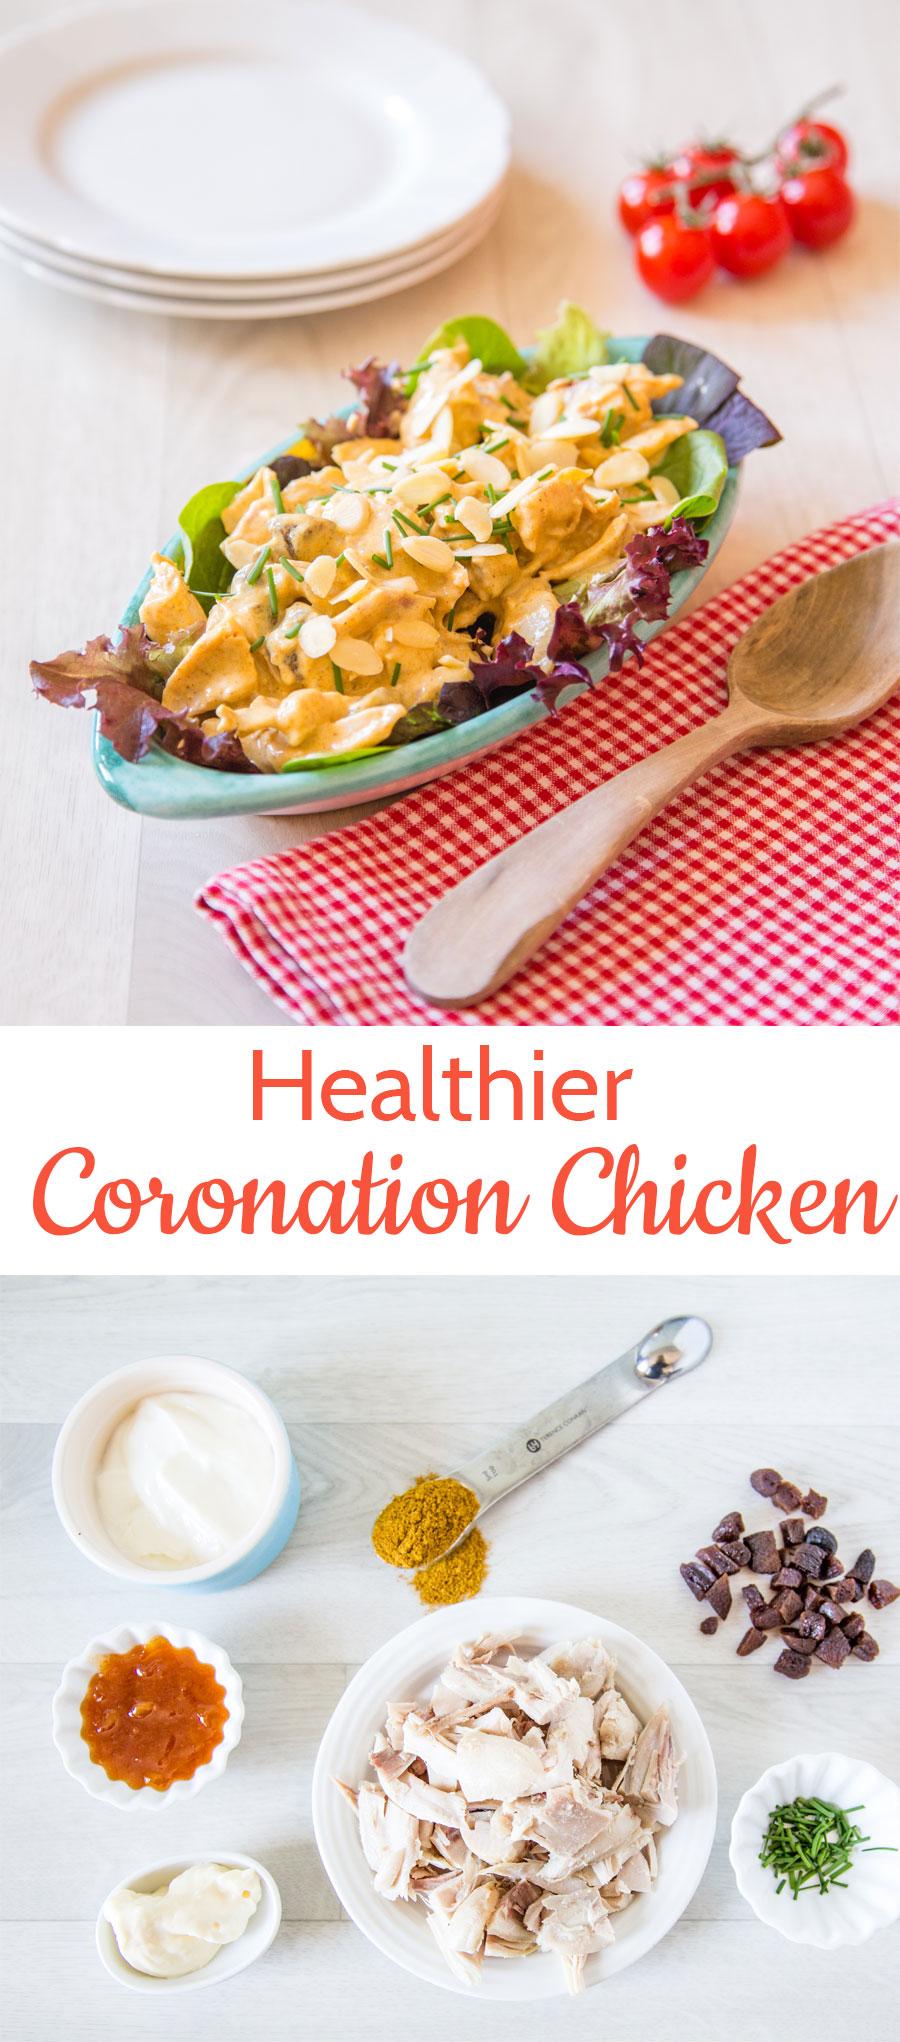 Easy coronation chicken sandwich recipe